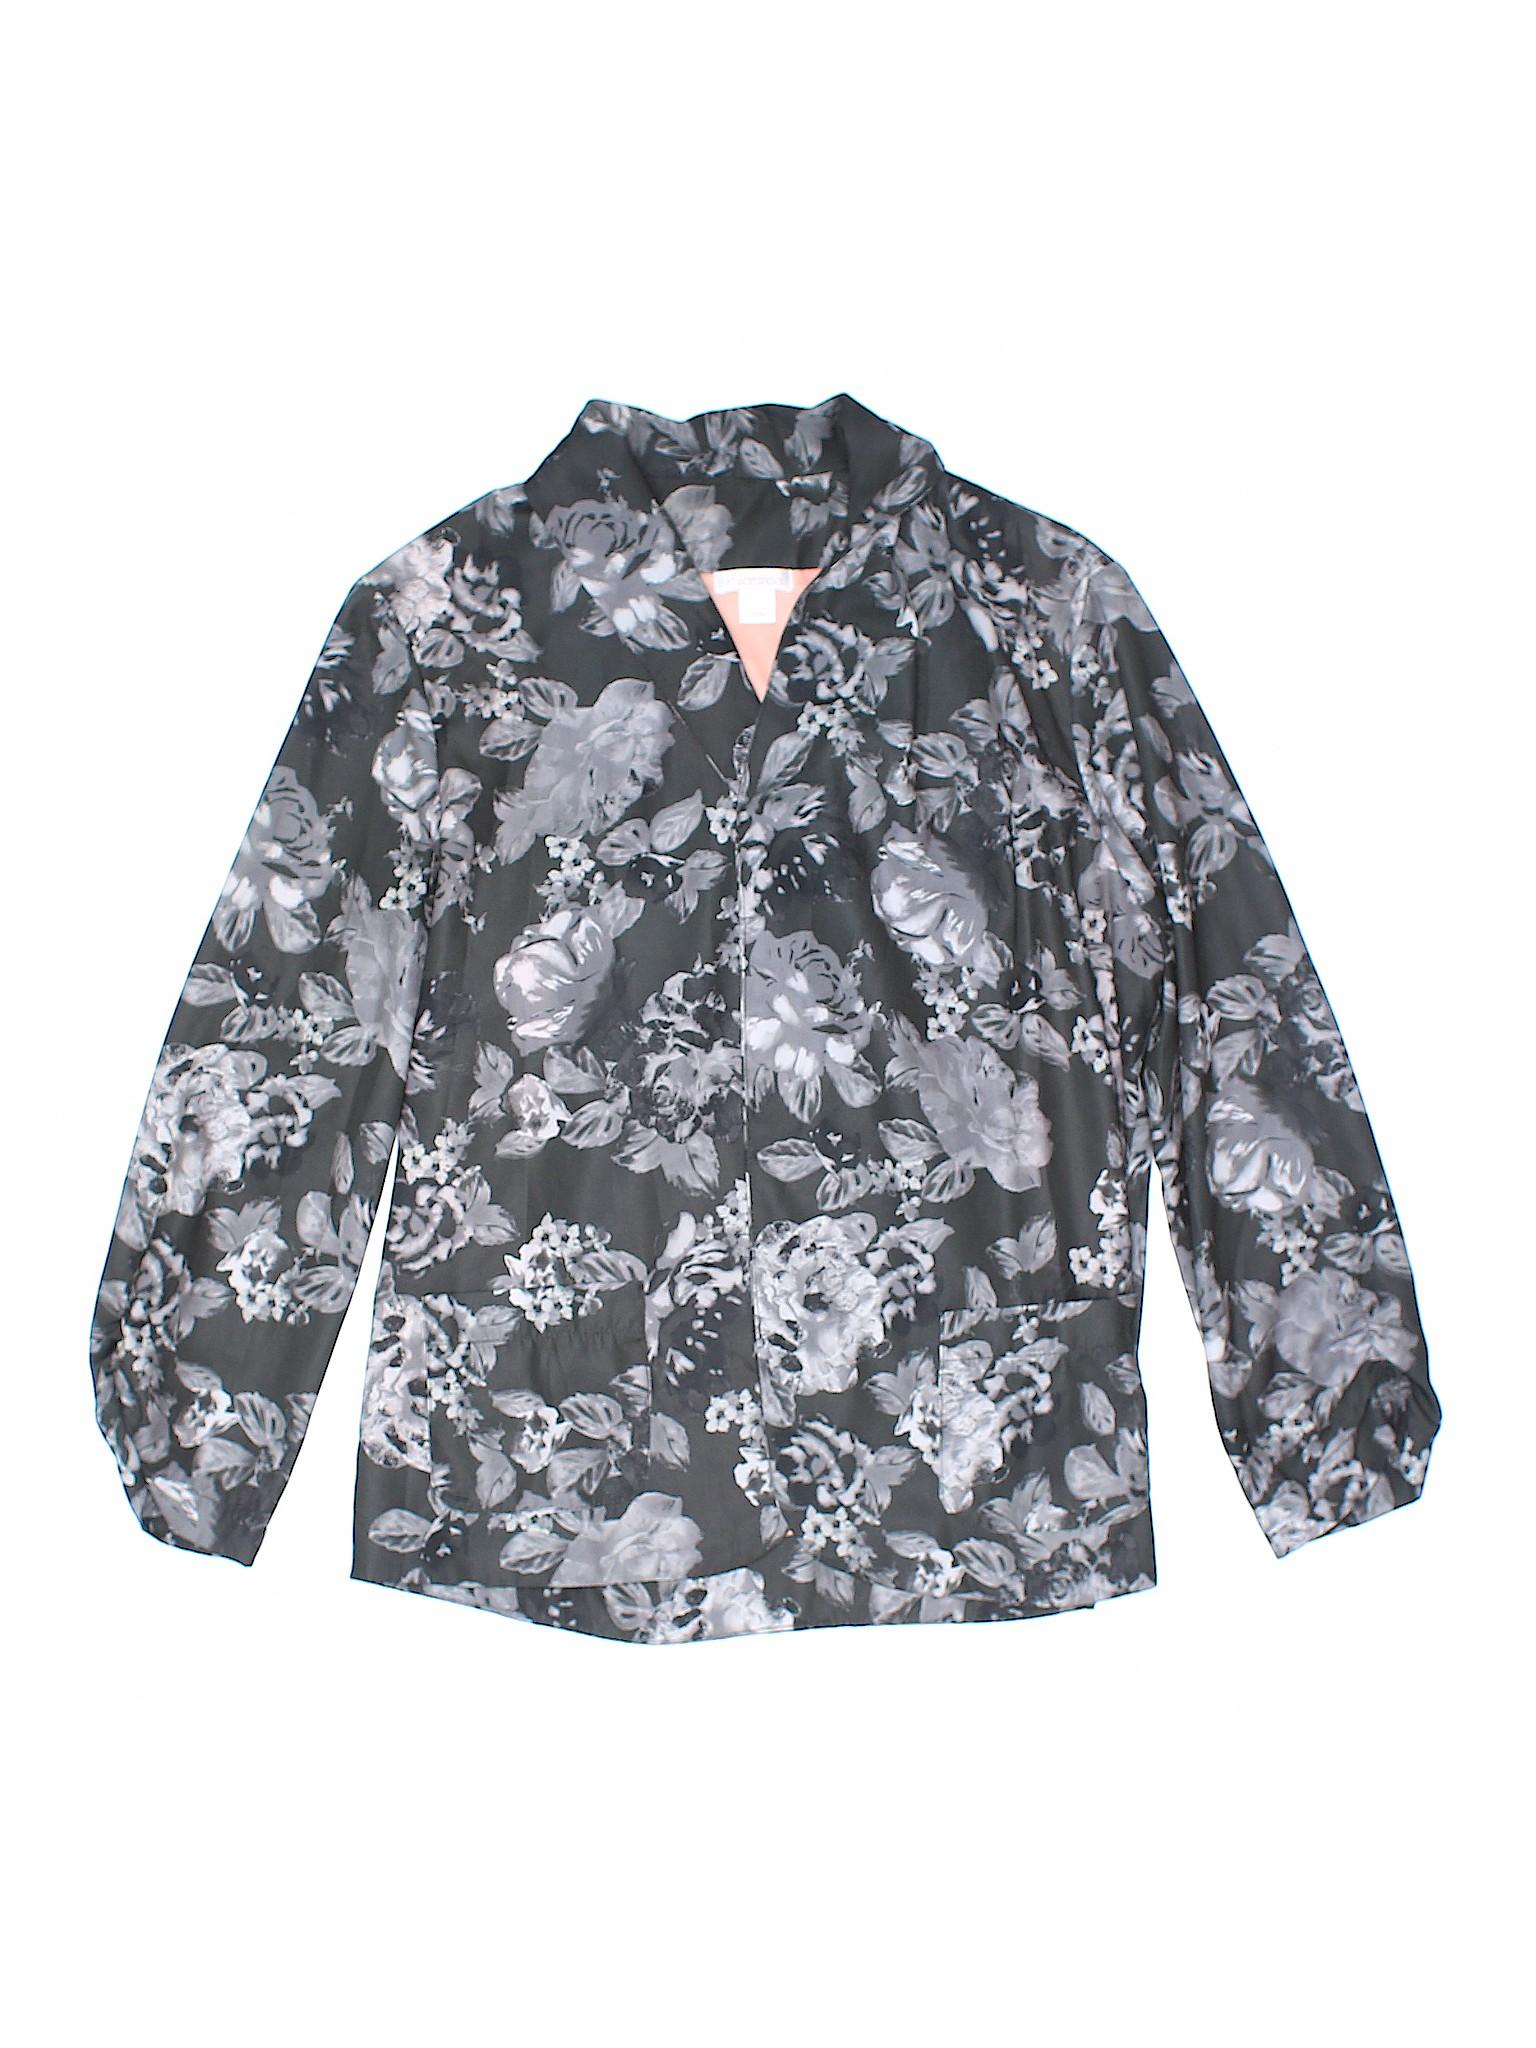 Boutique Boutique Blazer Xhilaration Xhilaration r4q5rH